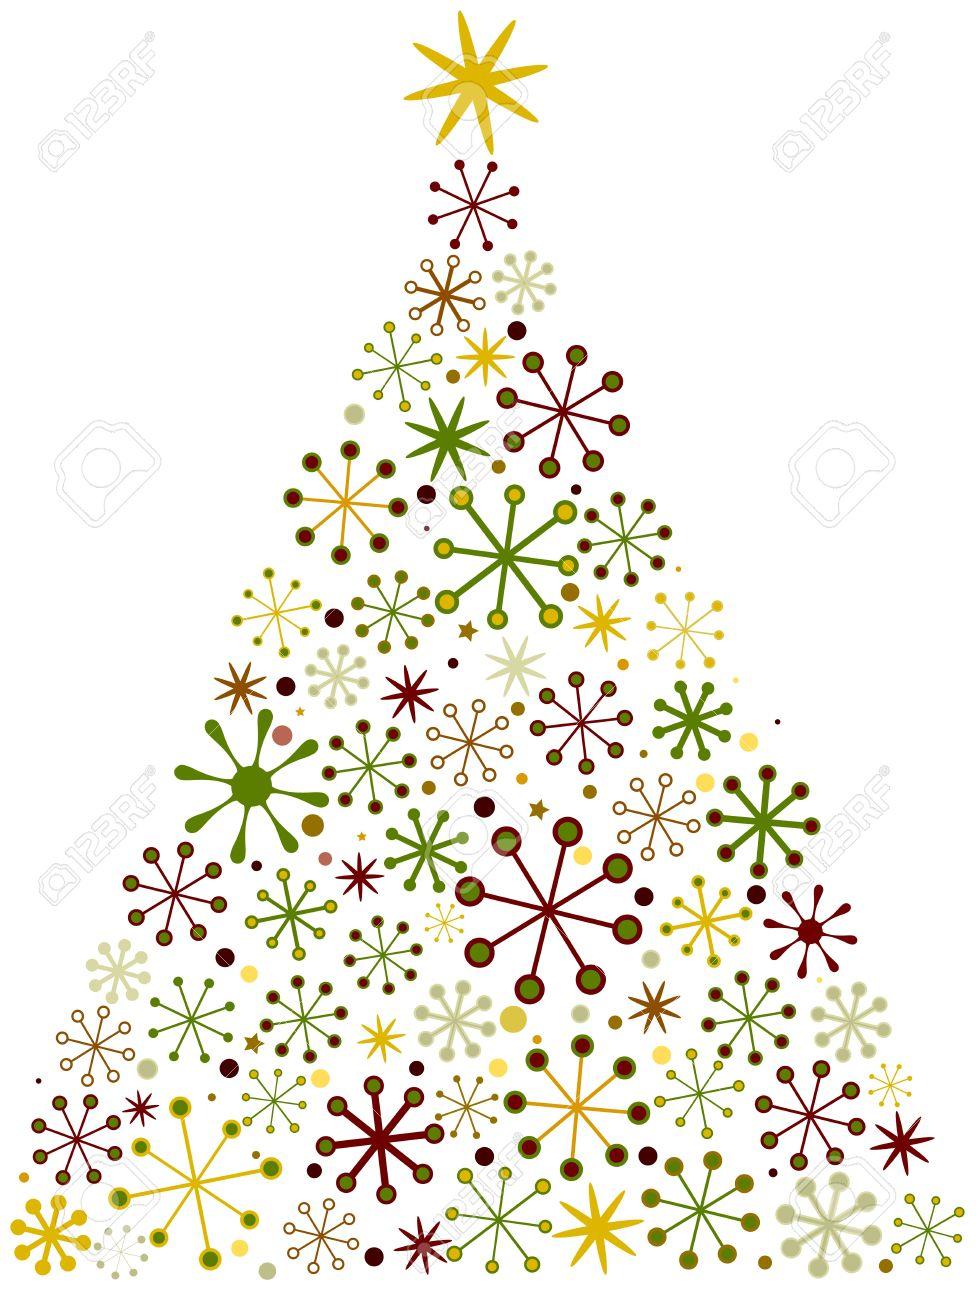 christmas tree design with a retro look stock photo 8492539 - Retro Christmas Tree